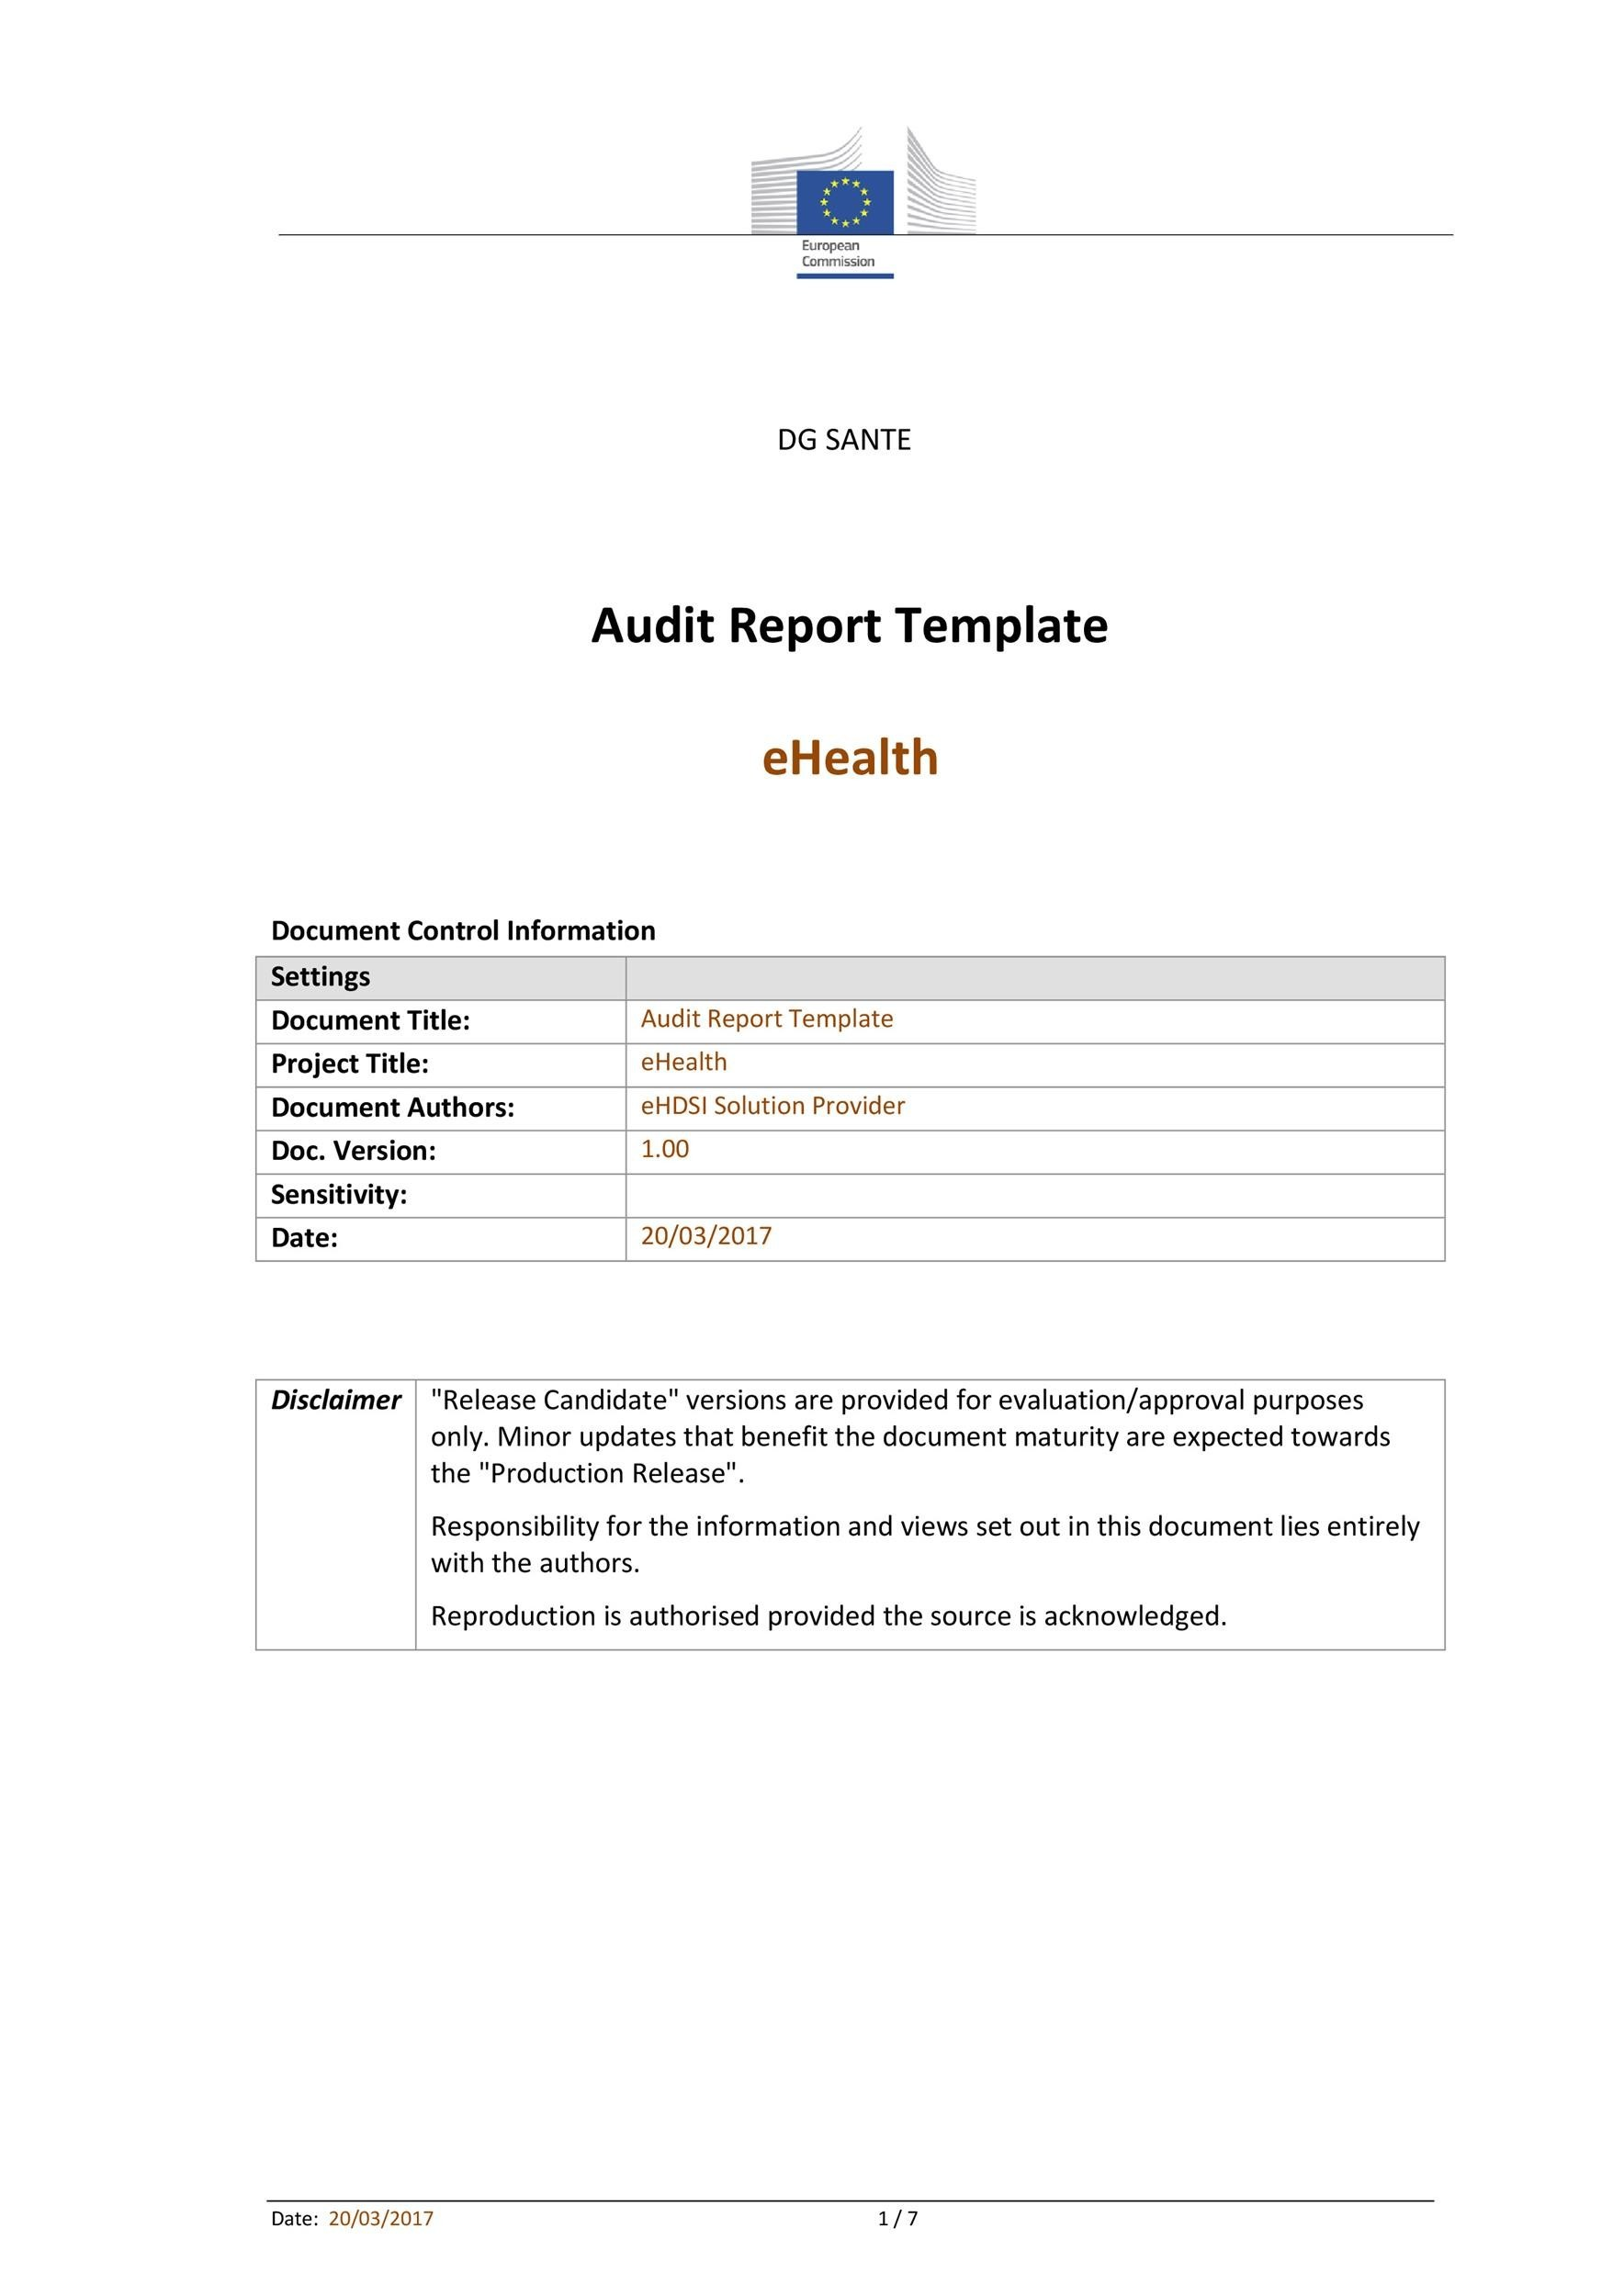 50 Free Audit Report Templates (Internal Audit Reports) ᐅ